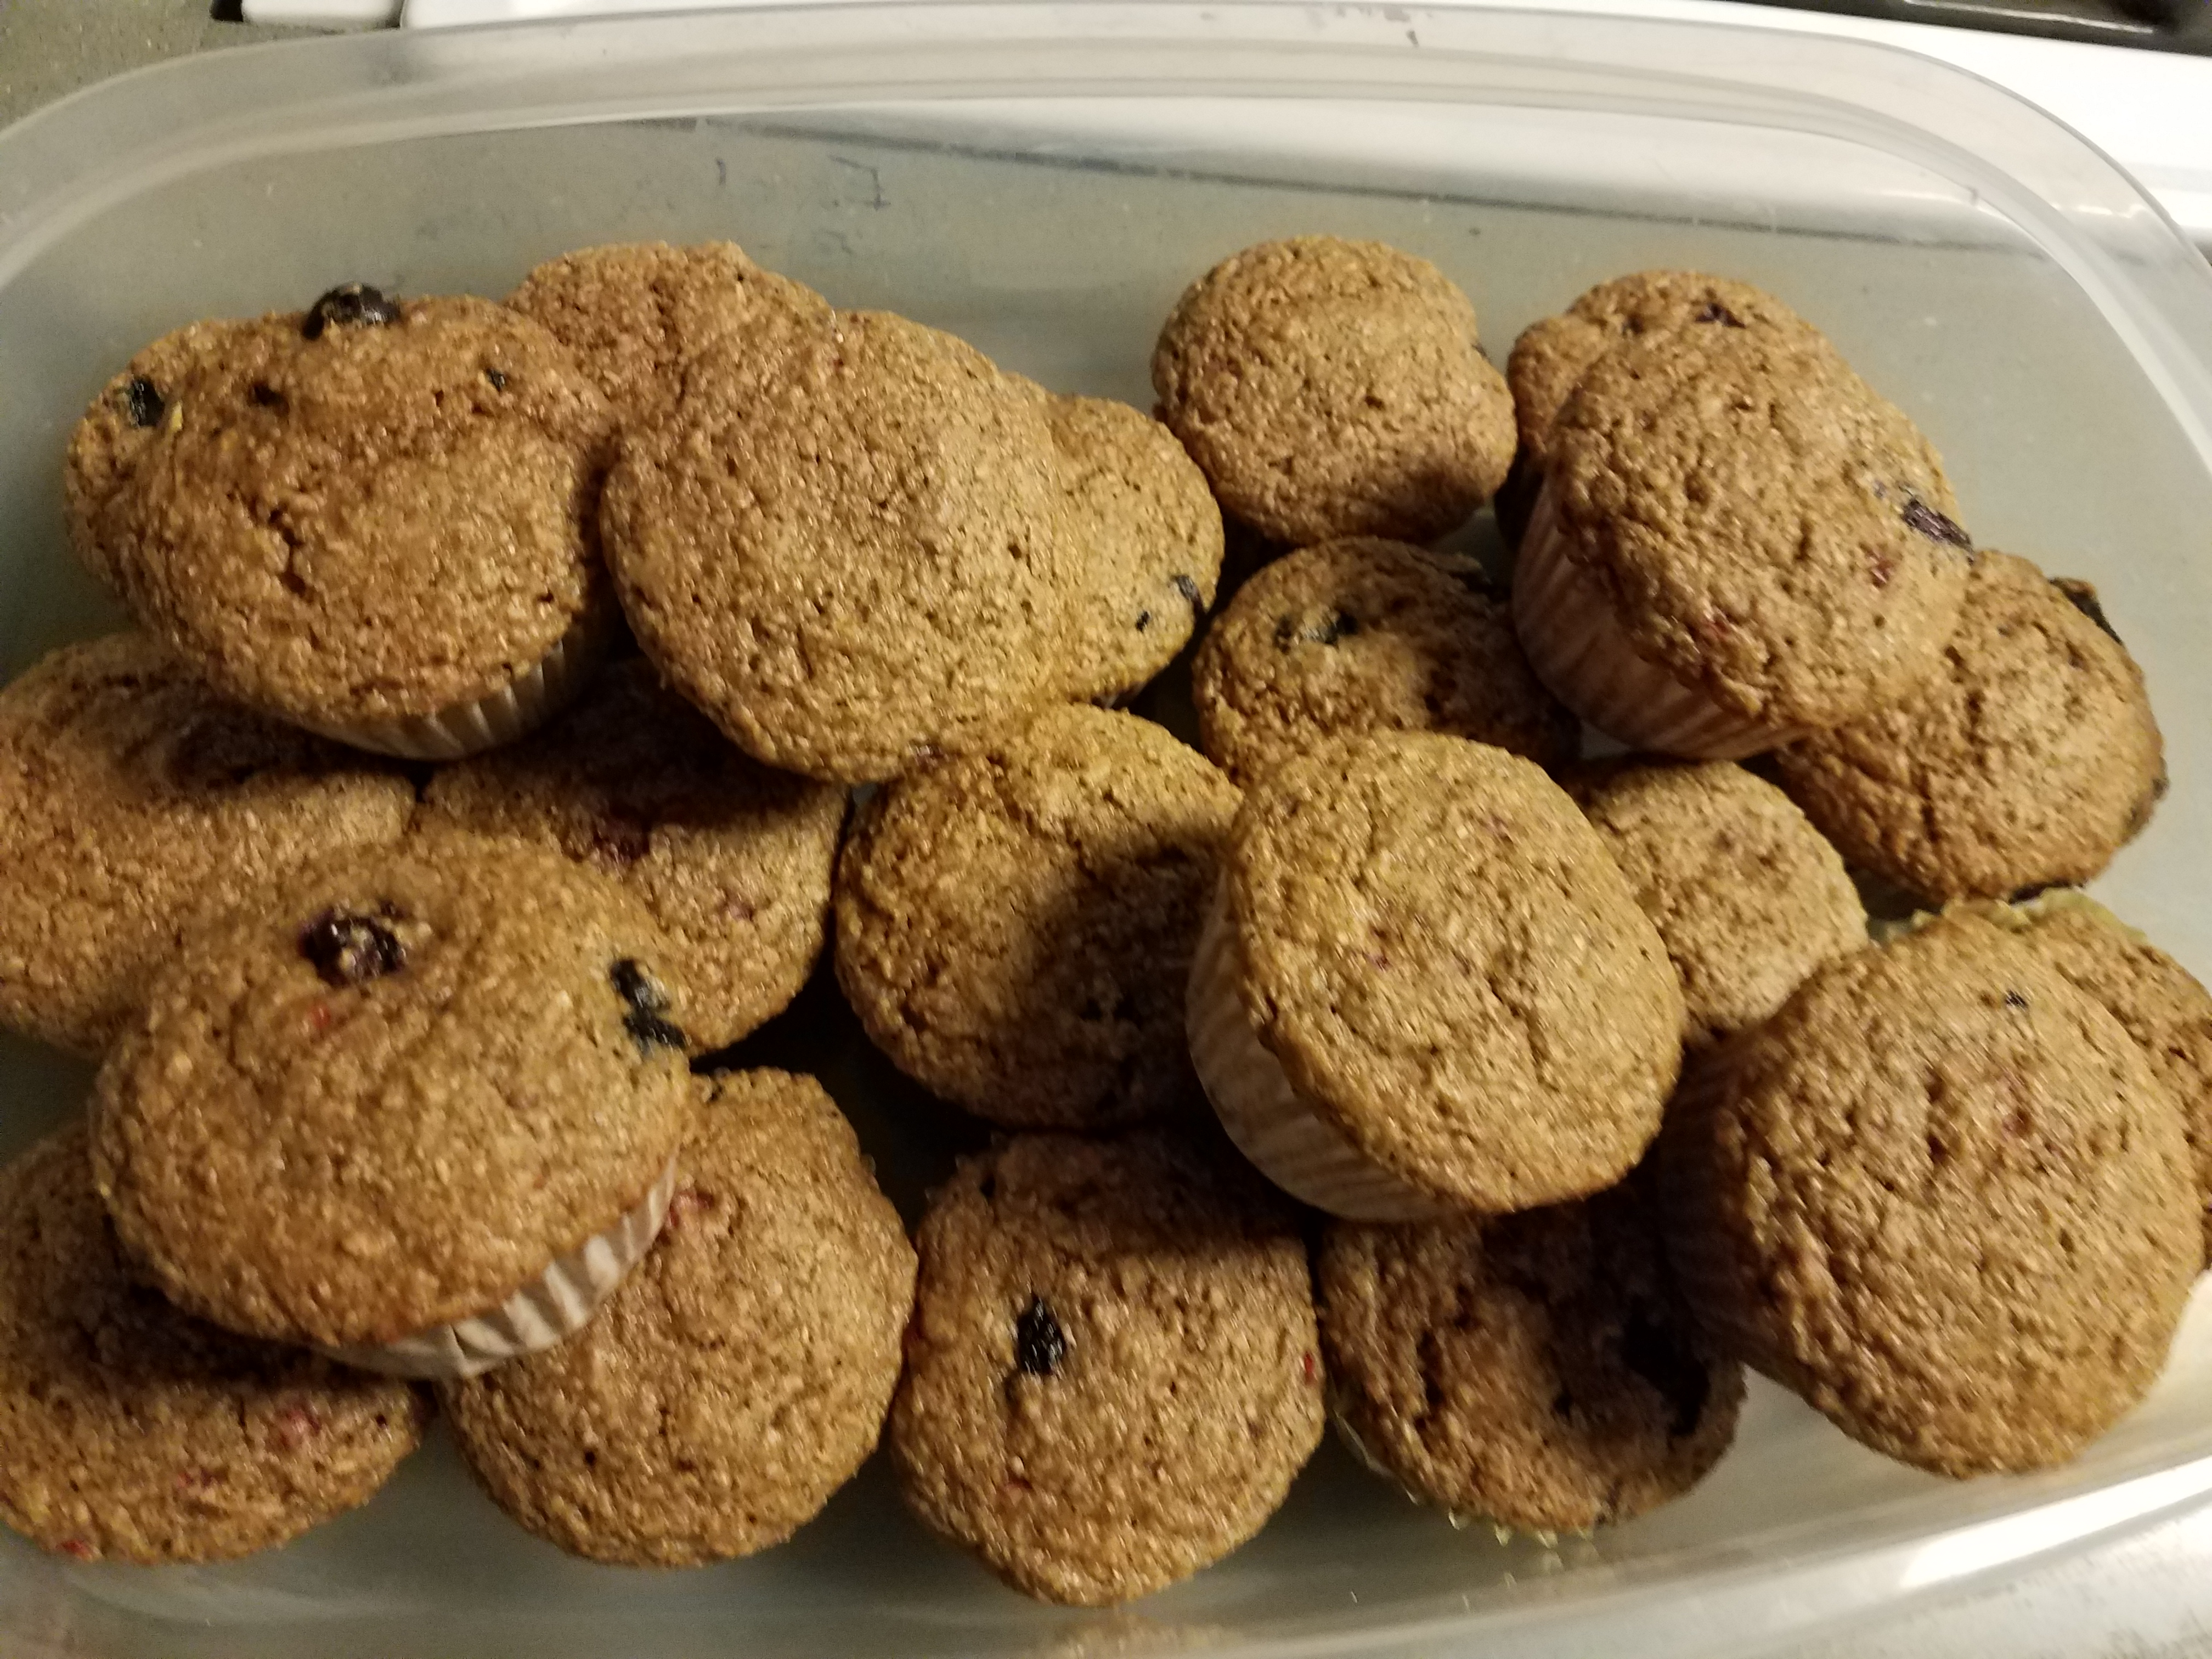 Whole Wheat Oatmeal Strawberry Blueberry Muffins